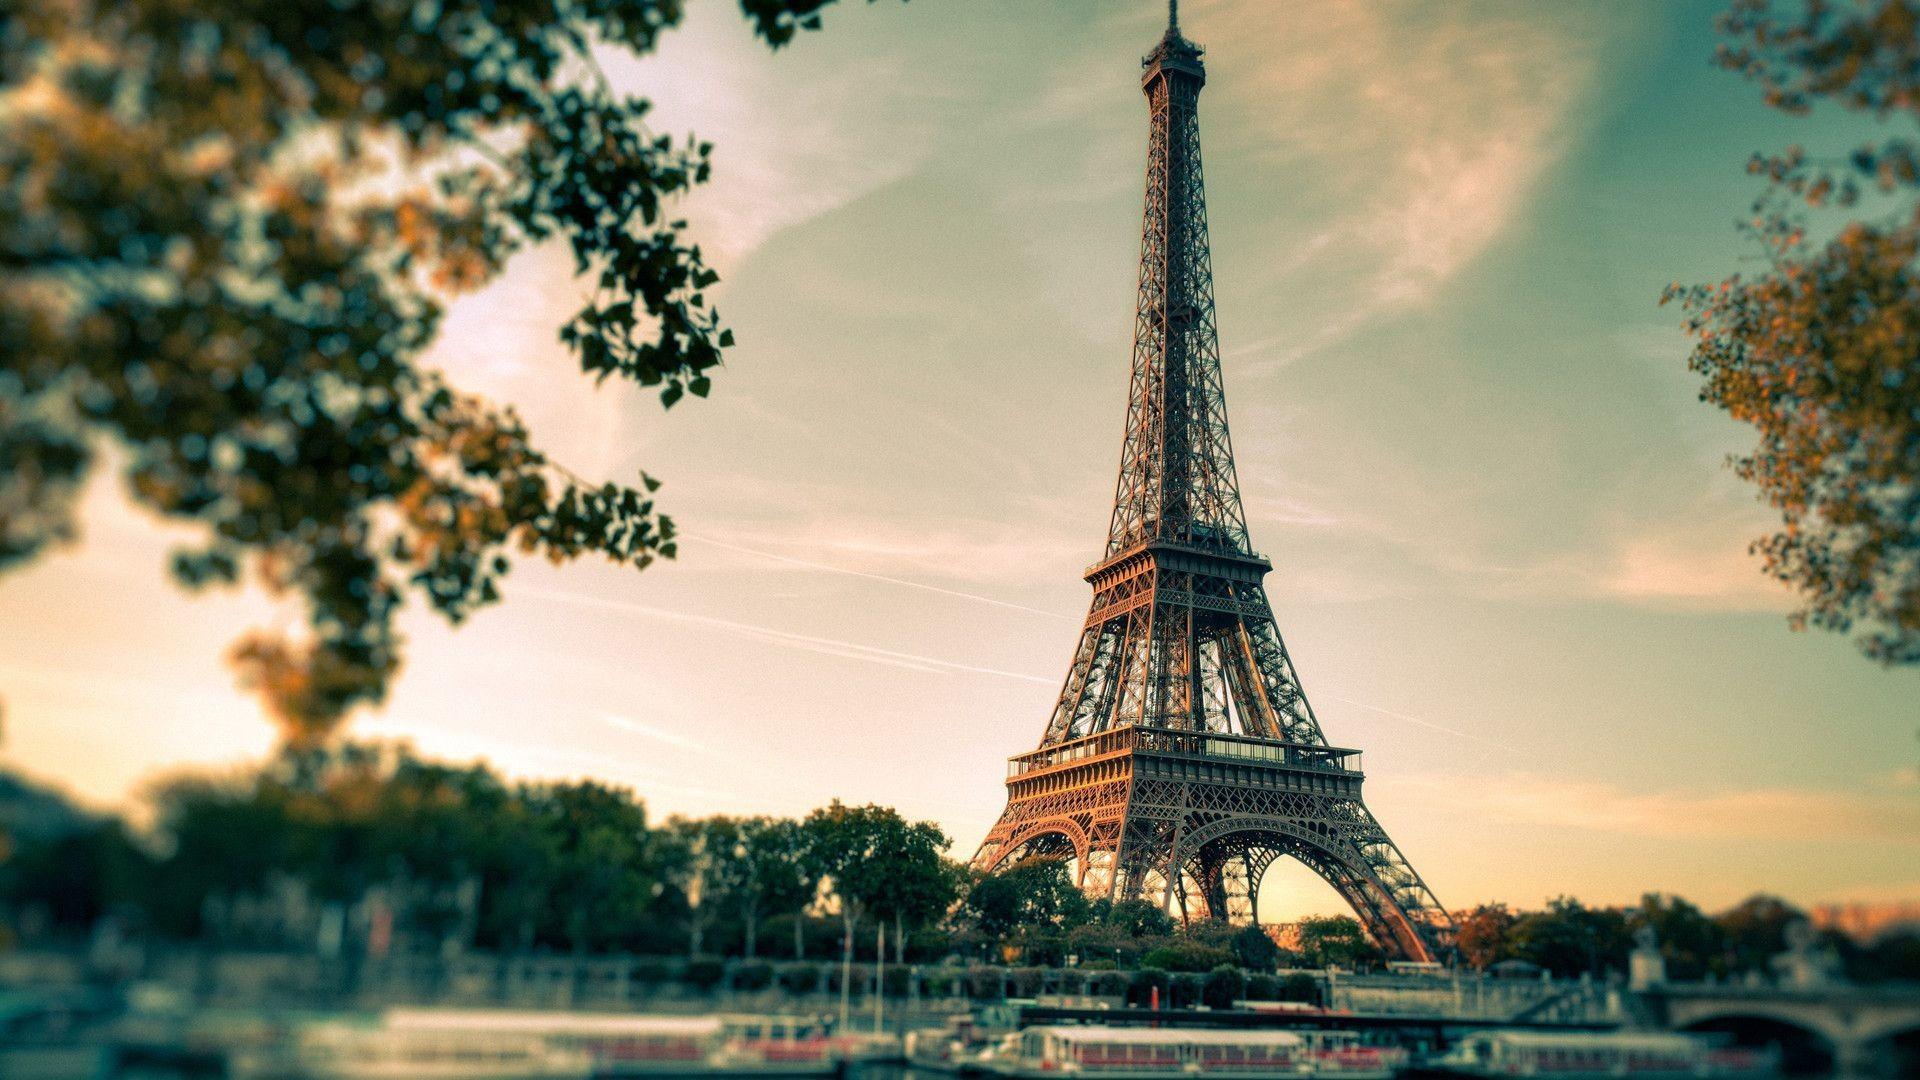 Paris Desktop Wallpaper 78 Pictures